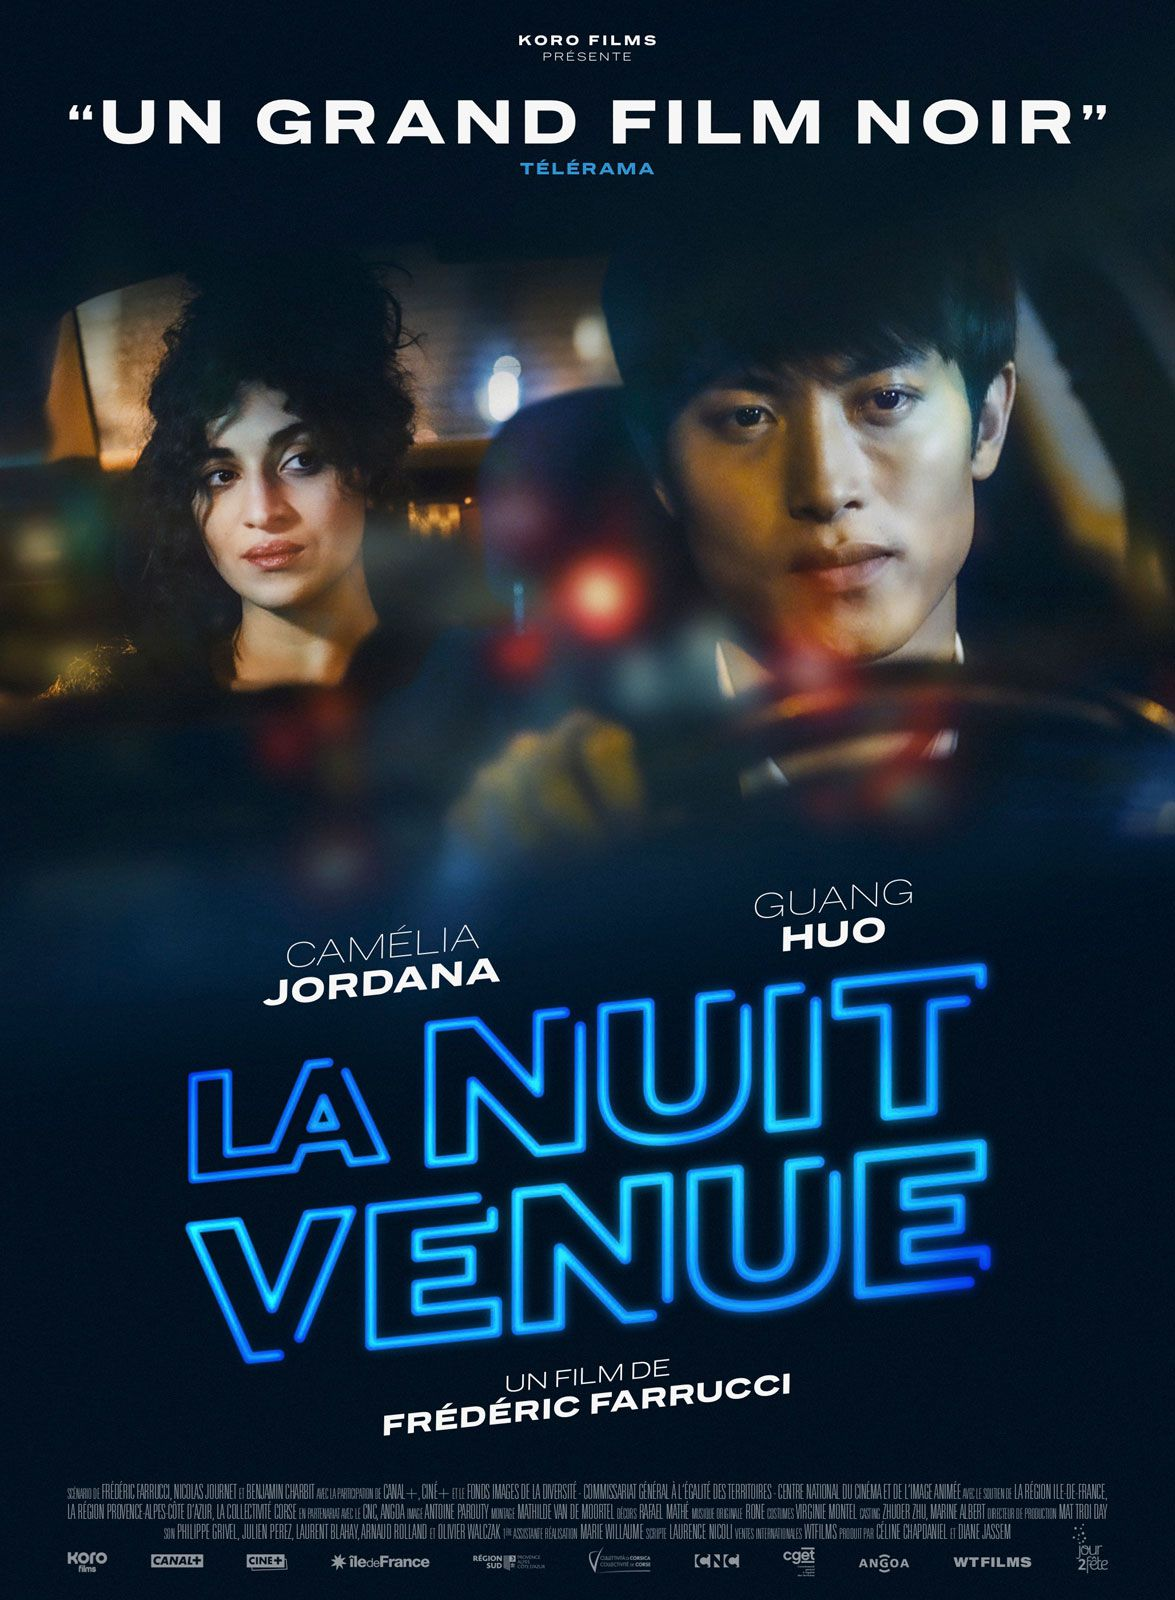 La Nuit venue - Film (2020)